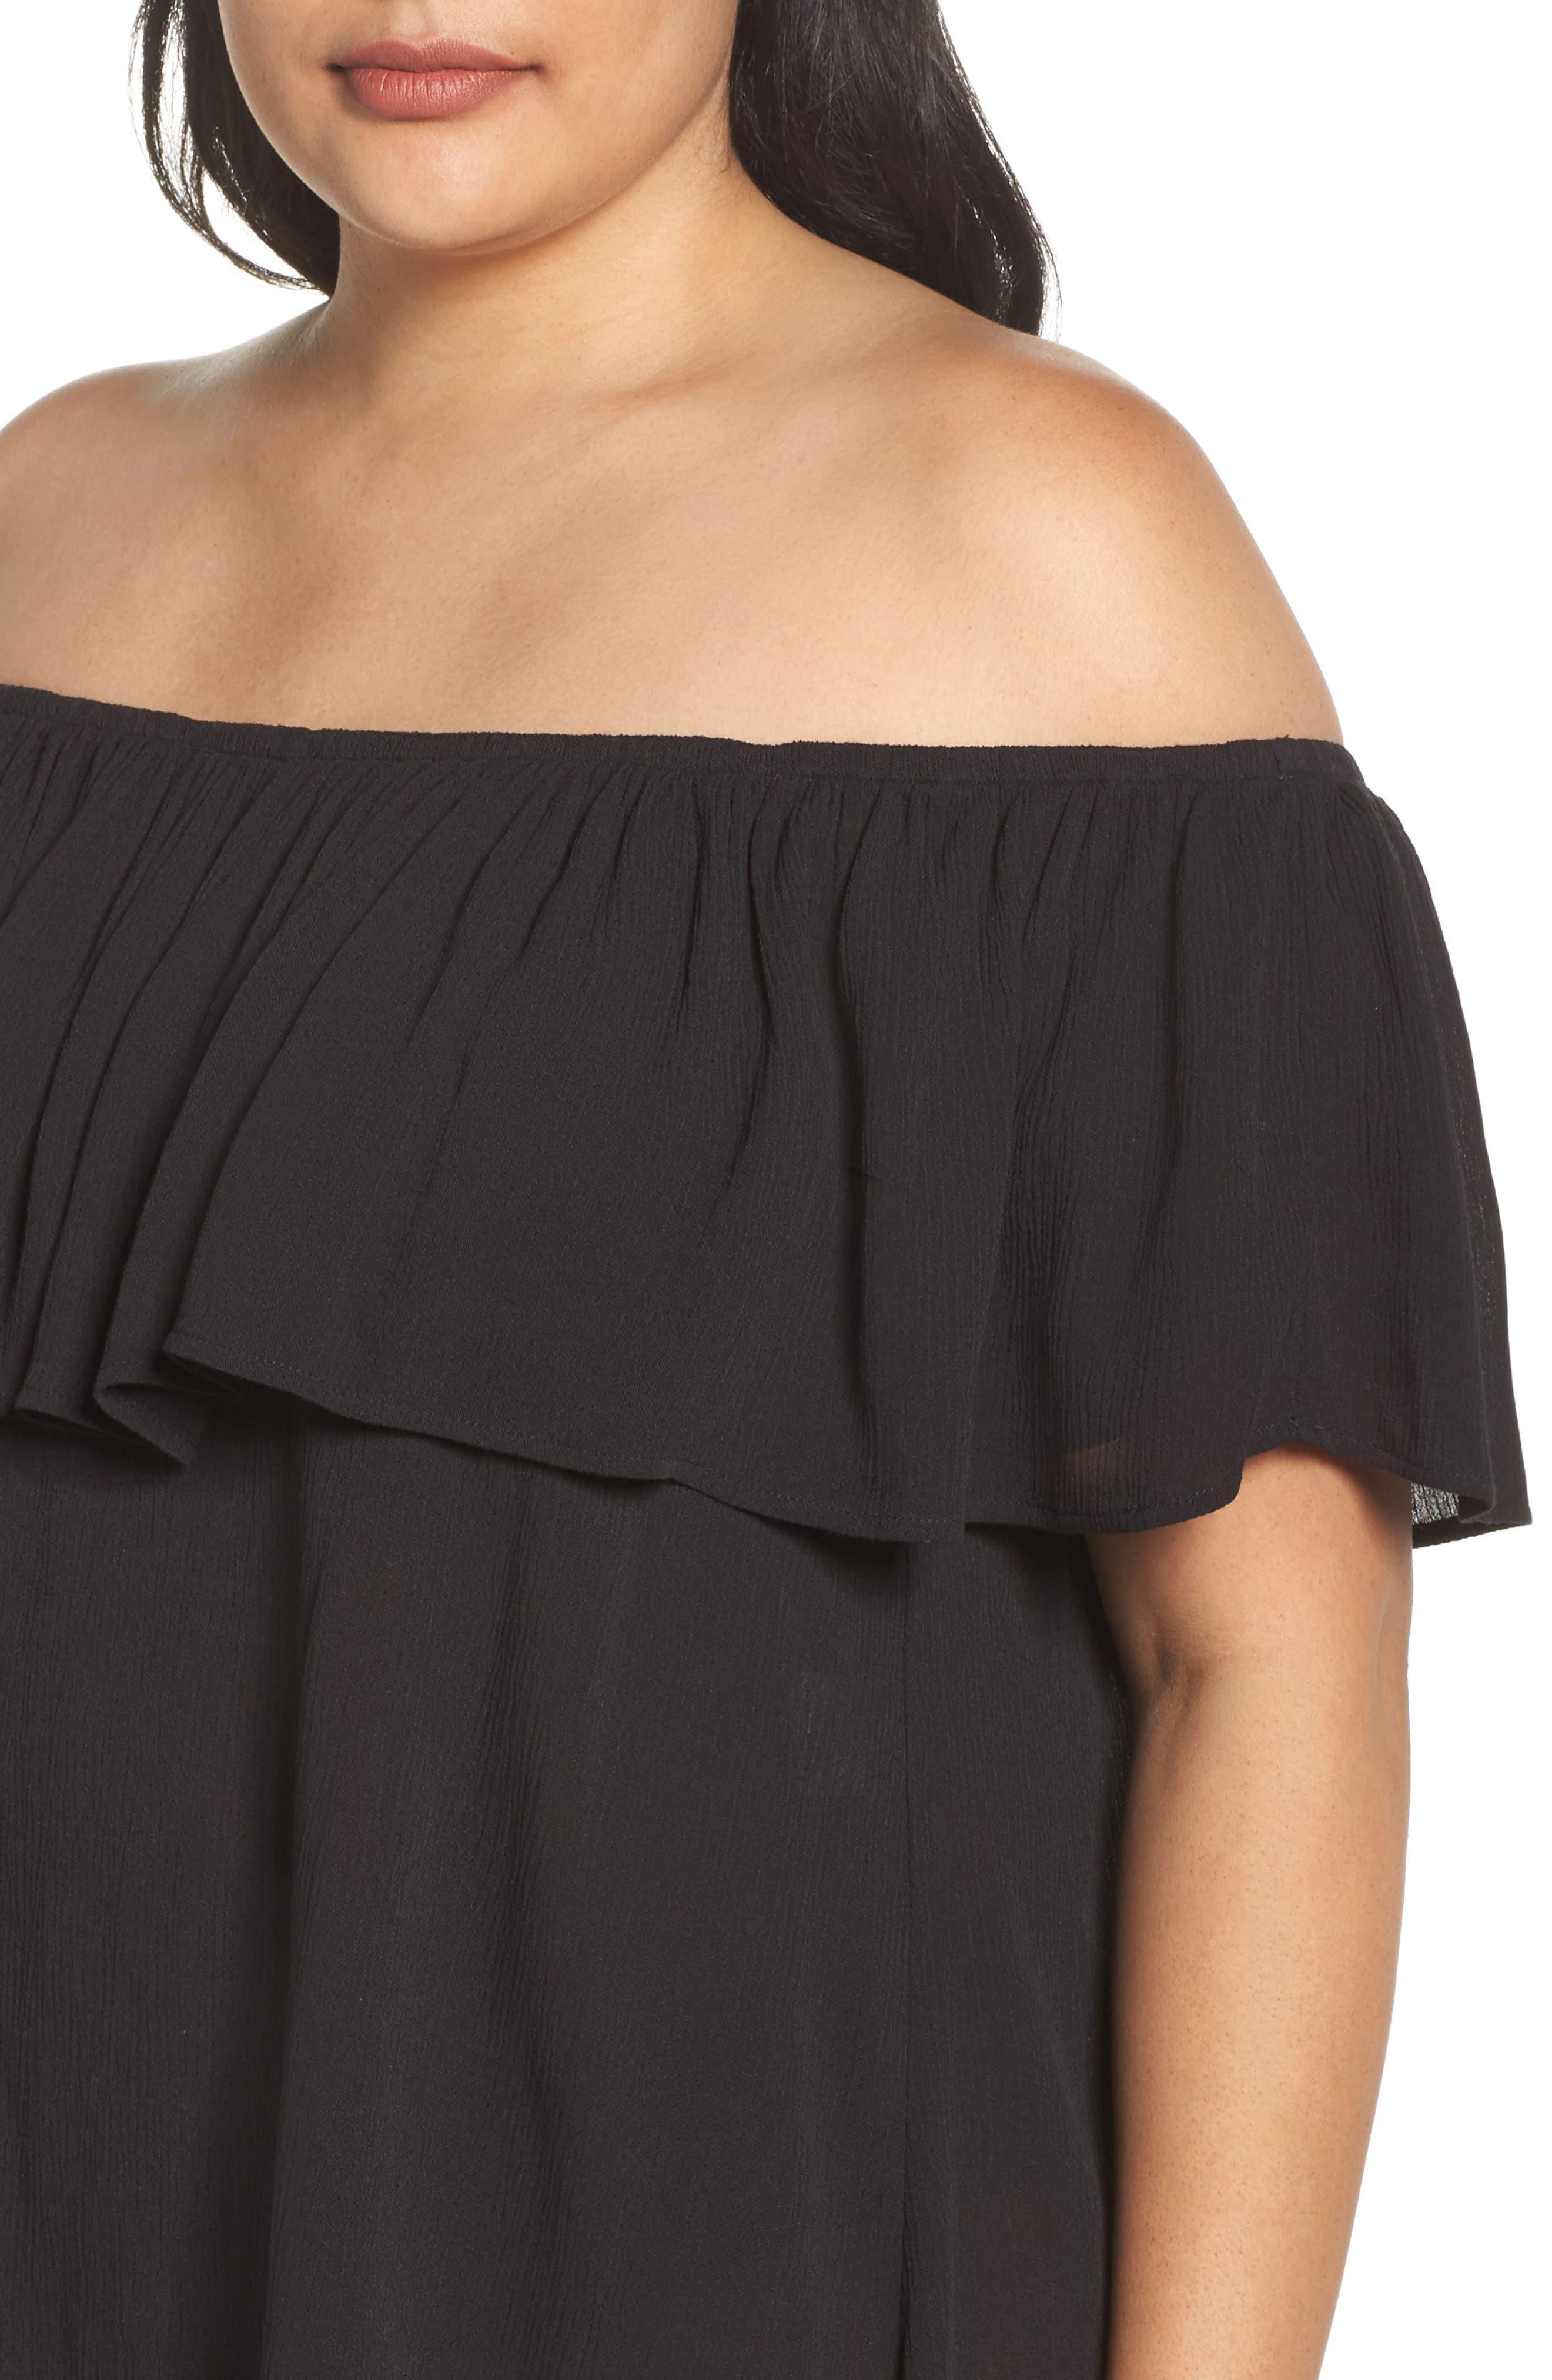 Southern Belle Off the Shoulder Cover-Up Dress,                             Alternate thumbnail 4, color,                             001